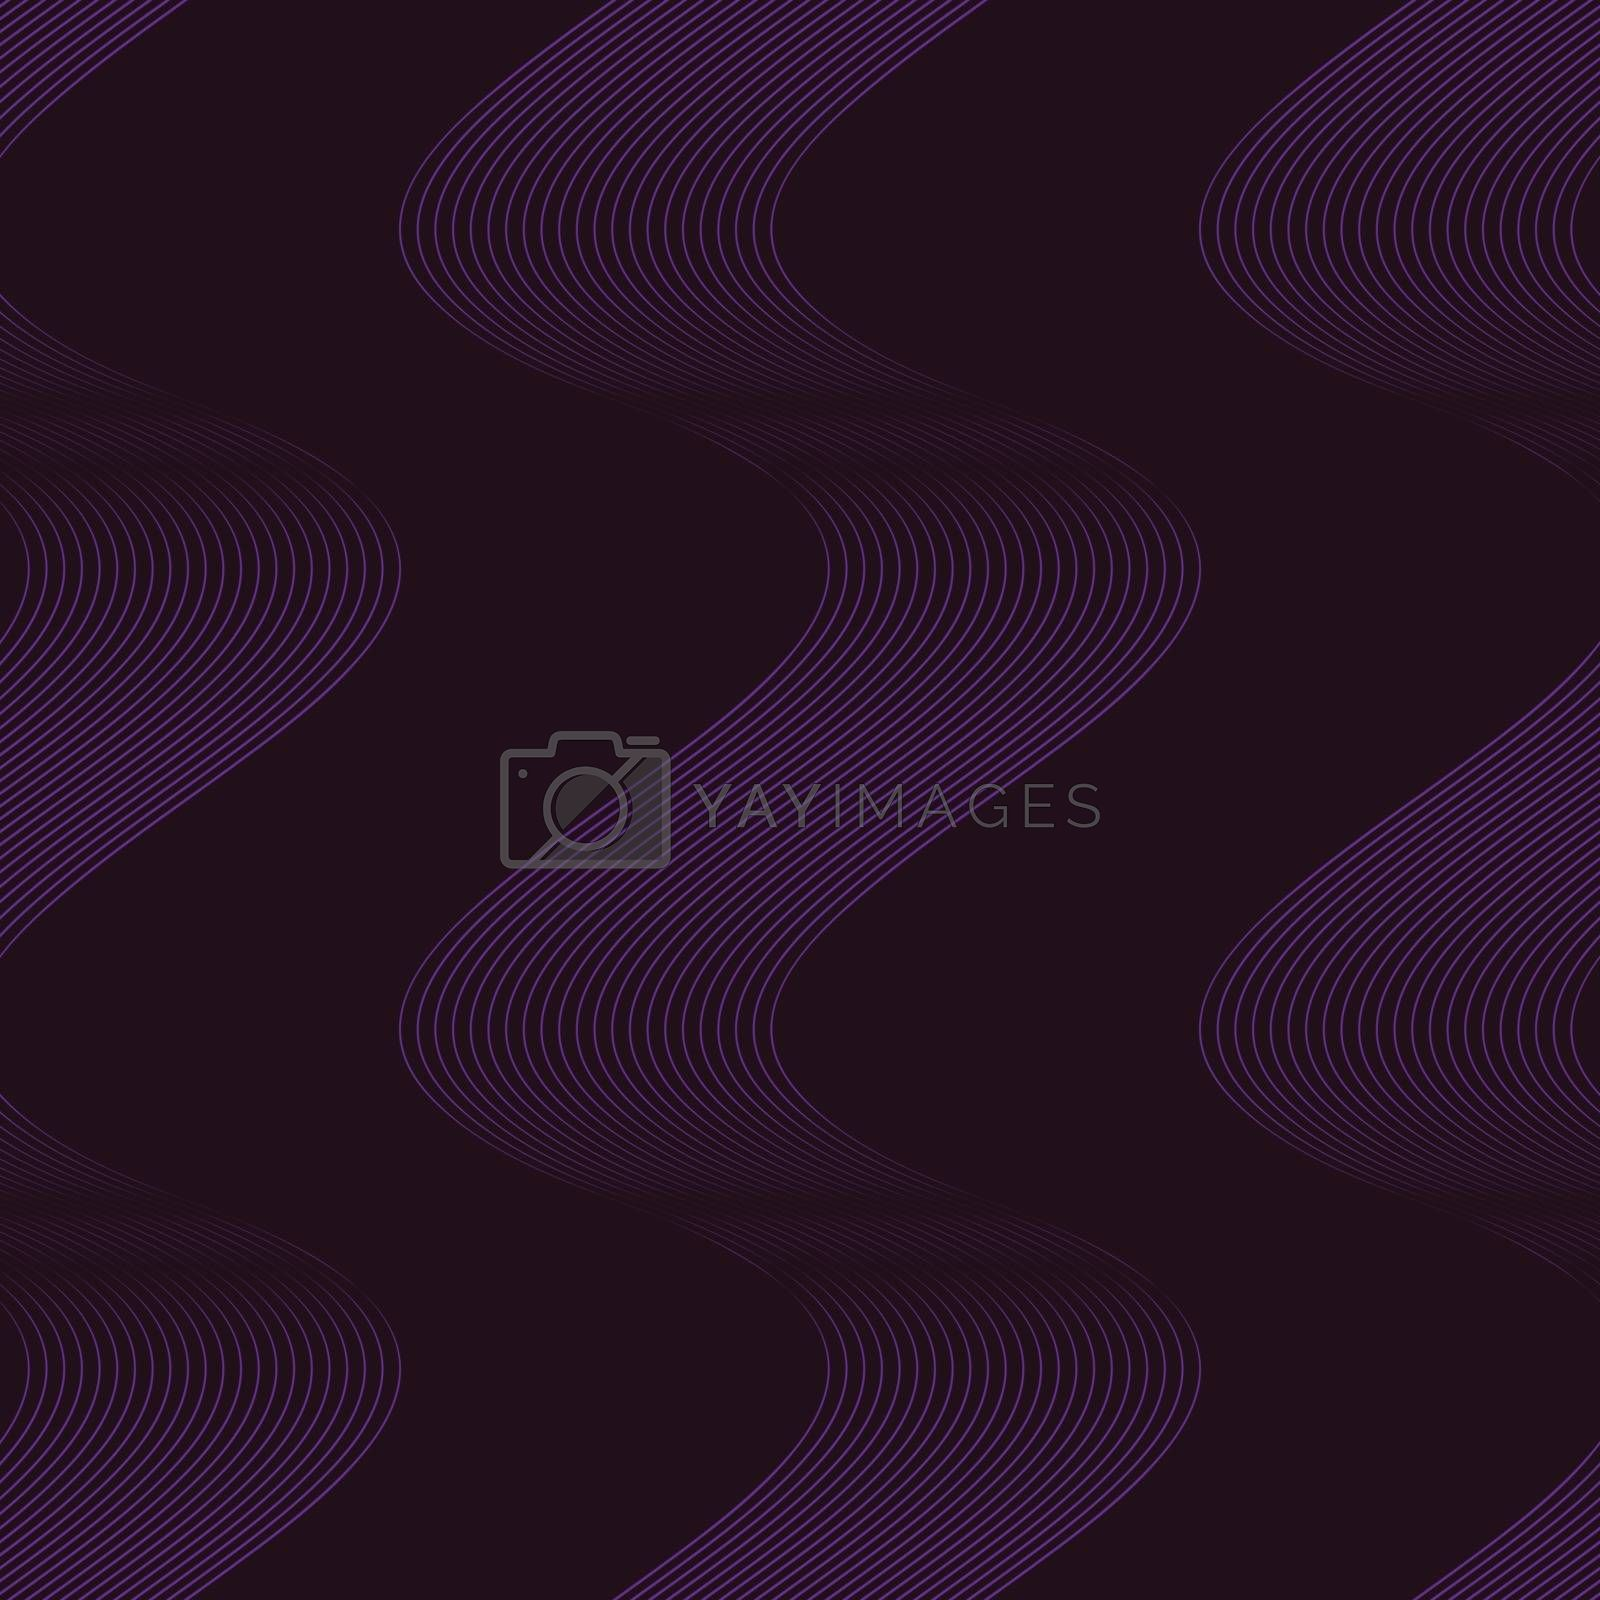 Elegant and simple modern minimalist seamless pattern with dark purple linear waves